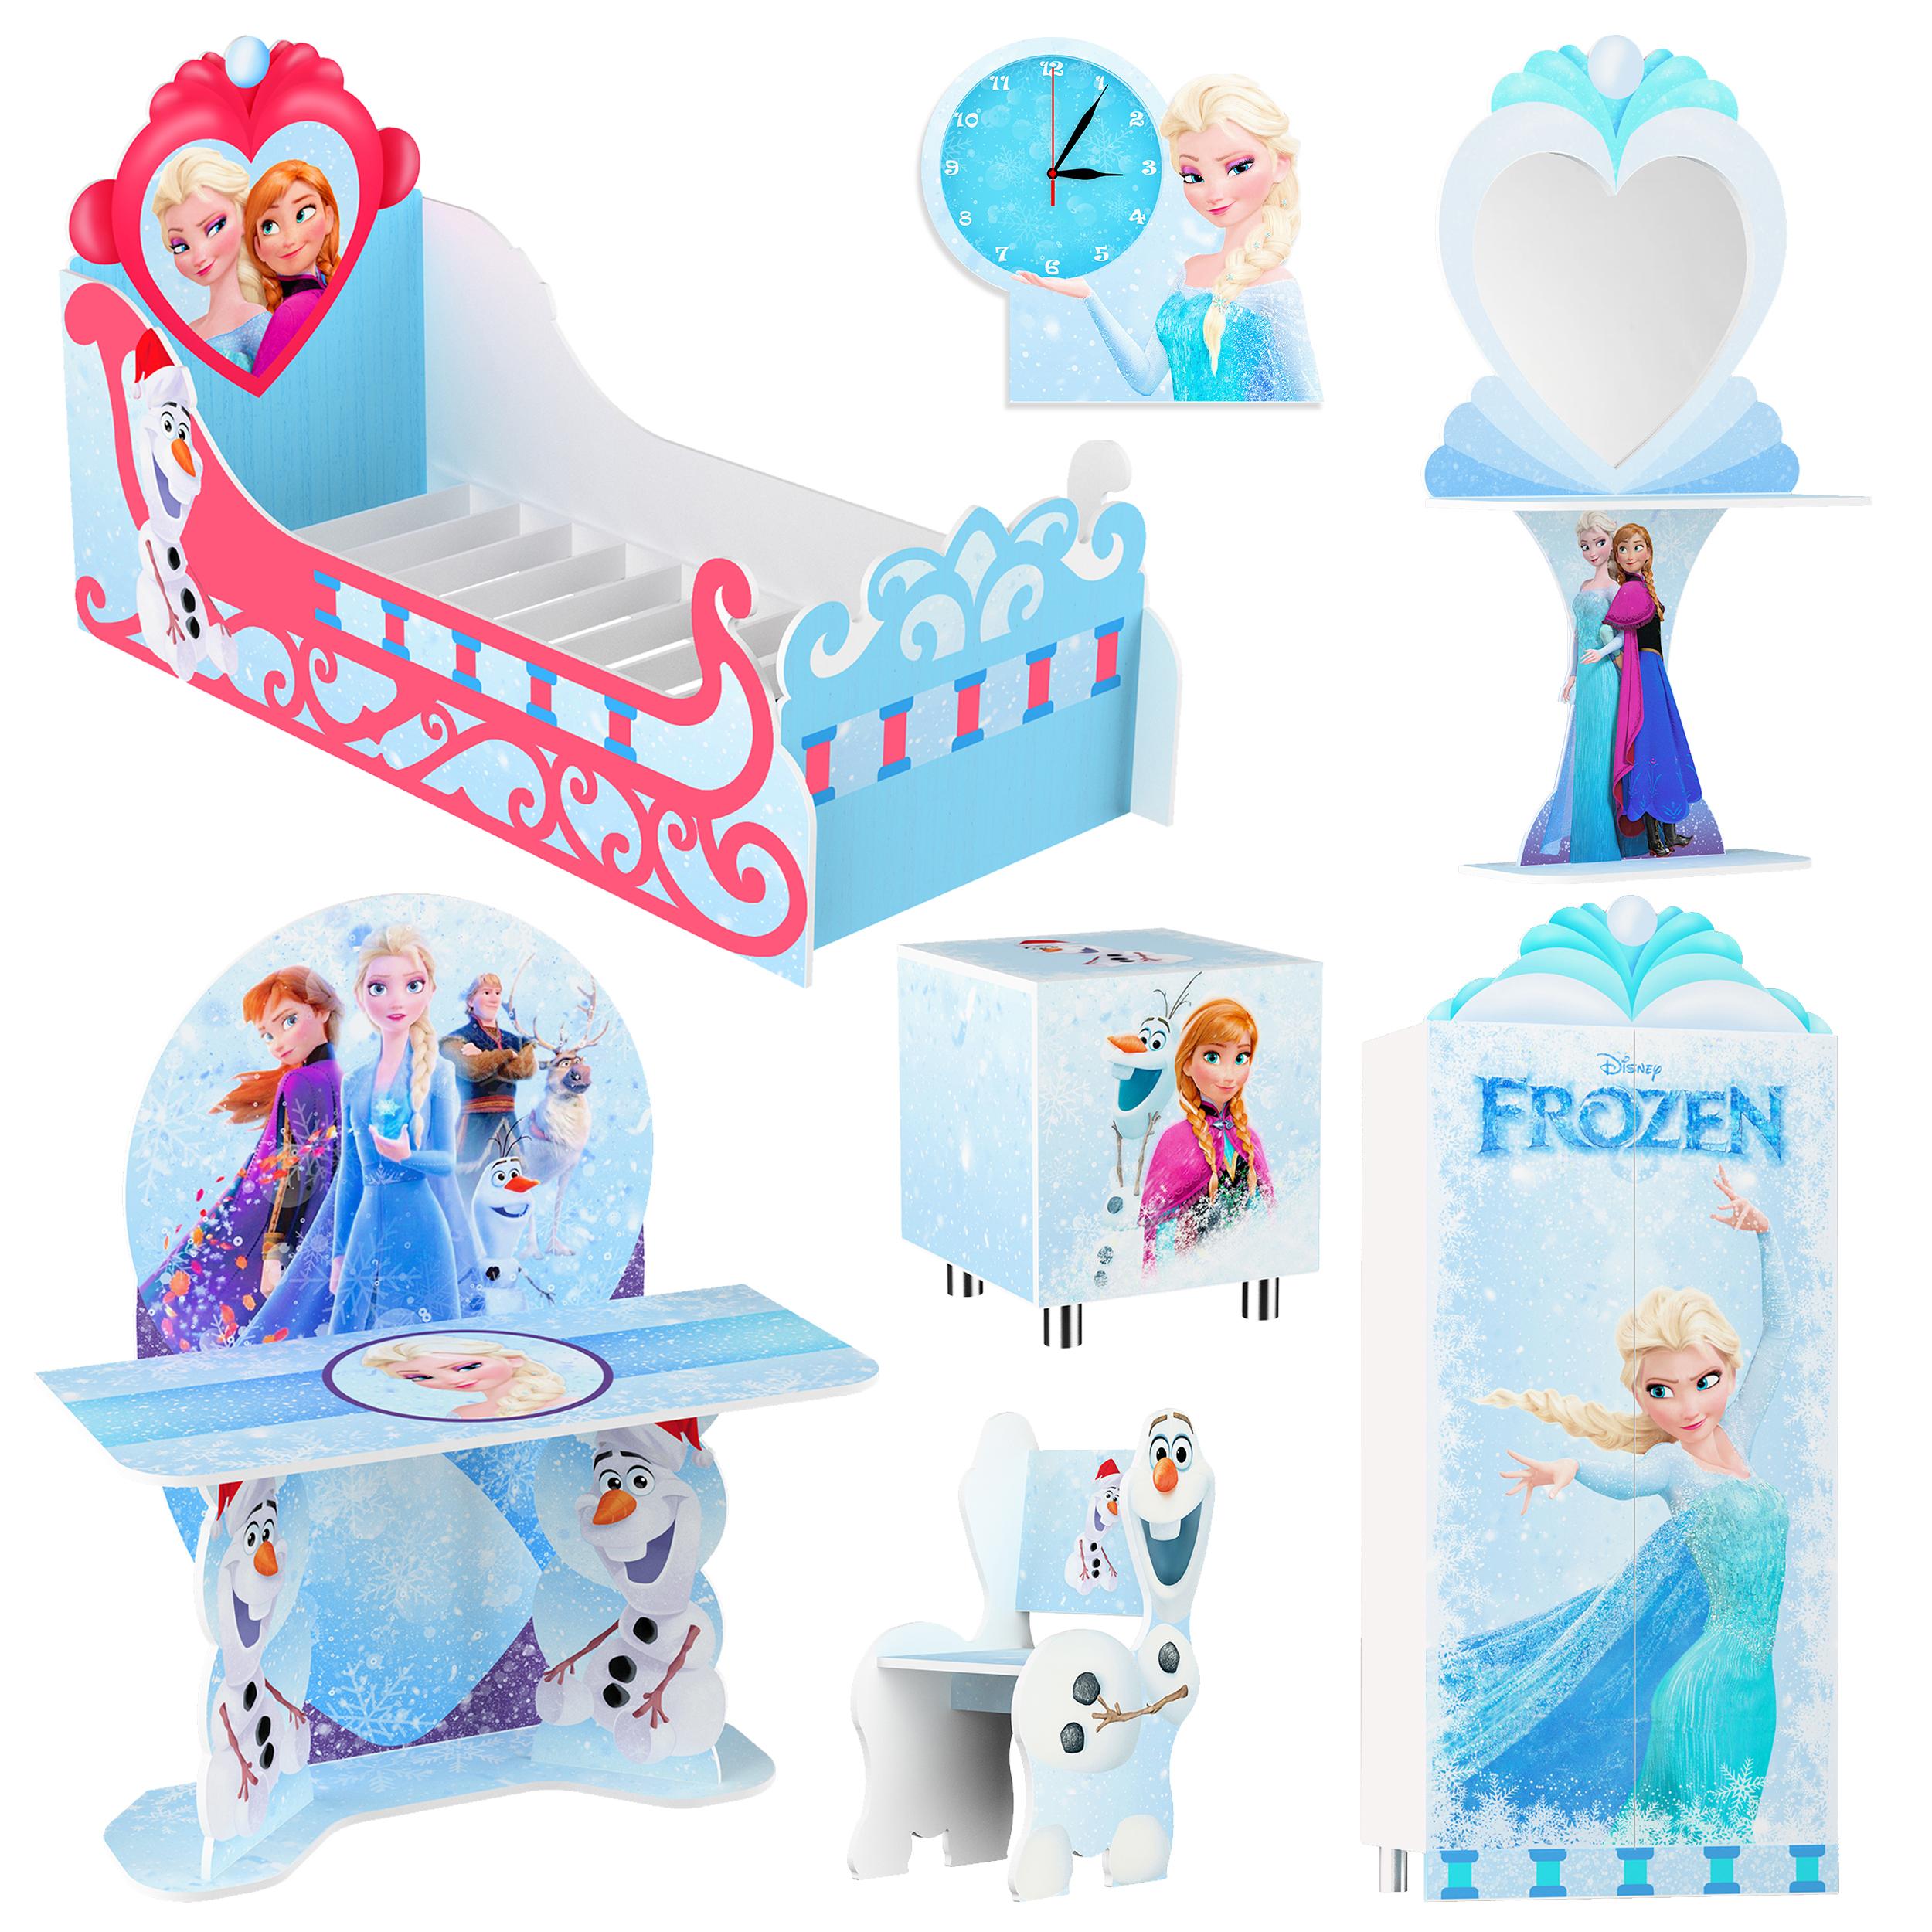 سرویس خواب کودک مدل فروزن کد Frozen-100